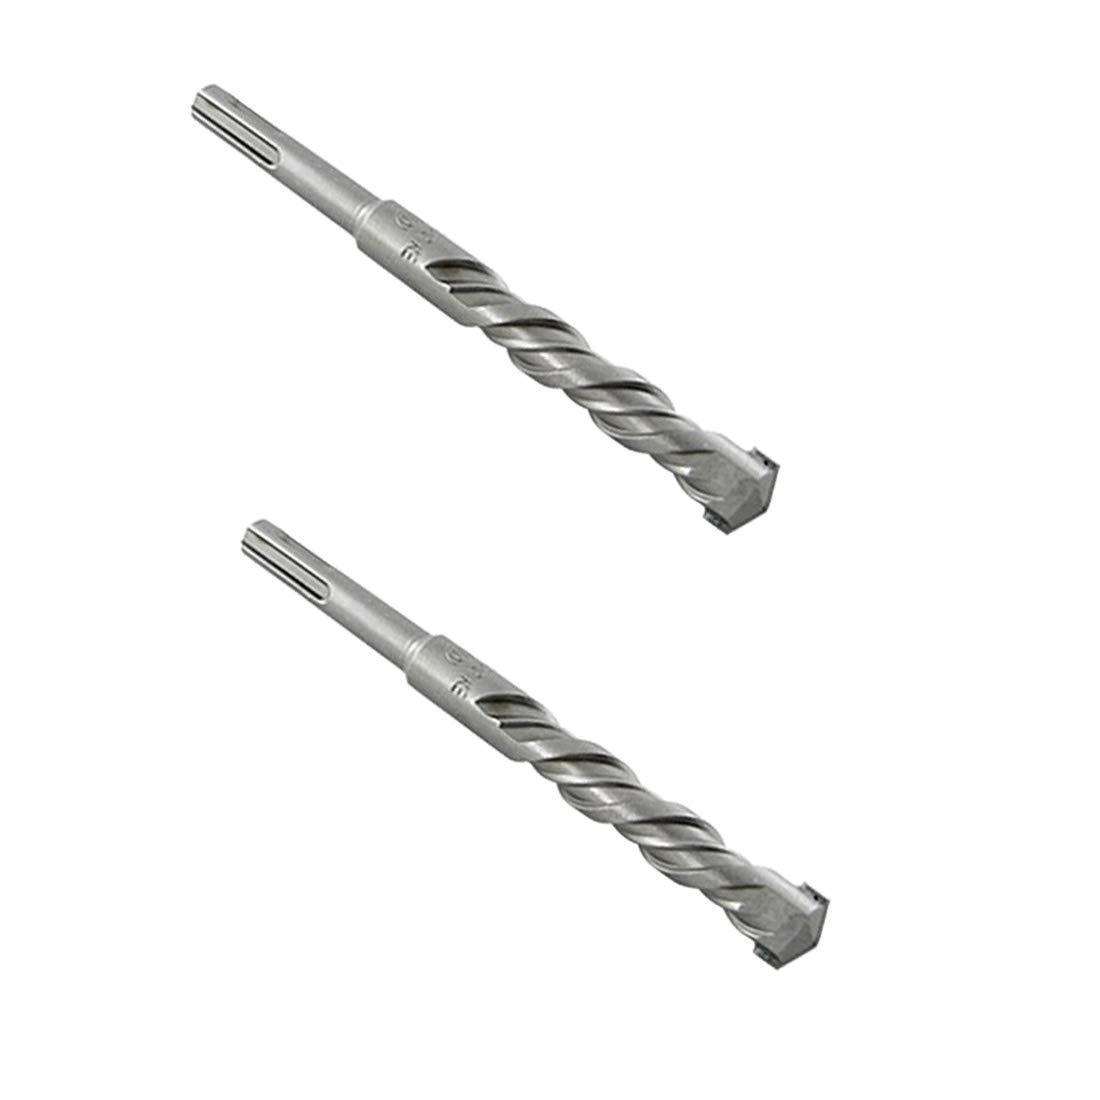 XMHF 16mm Diameter Tip SDS Plus Shank Masonry Hammer Drill Bit 2Pcs